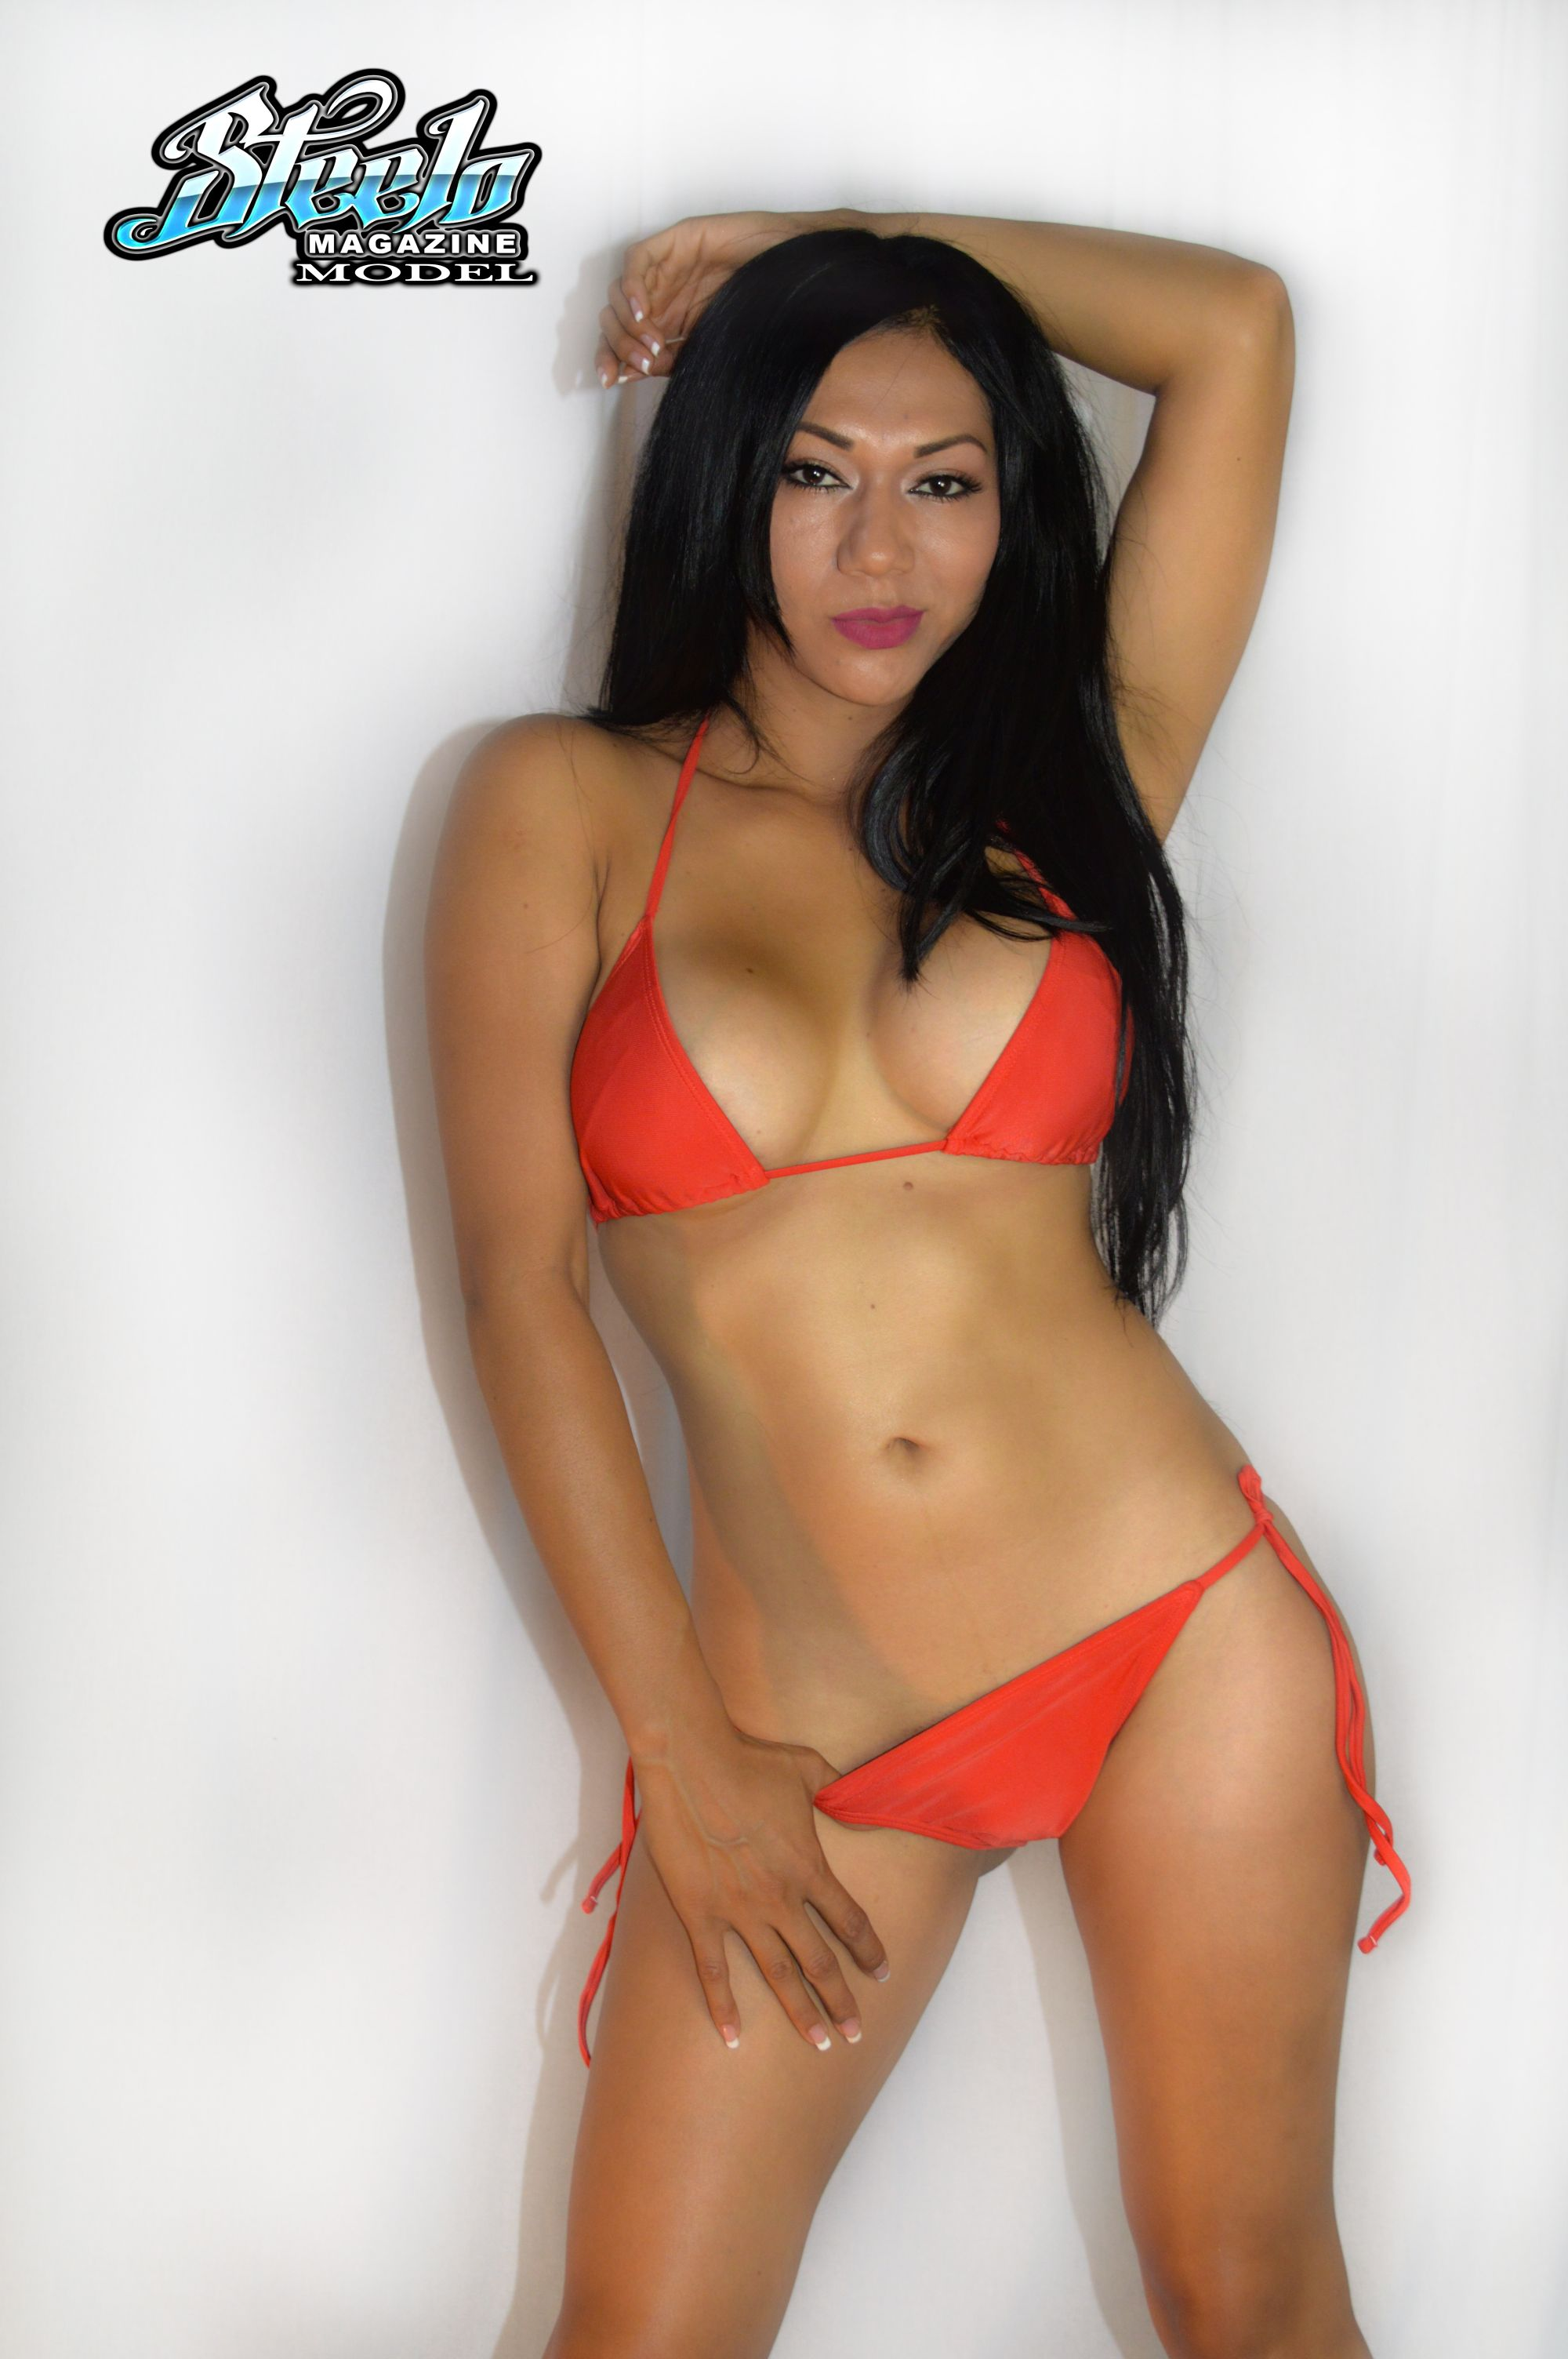 jackie-h-bikini-shoot-36